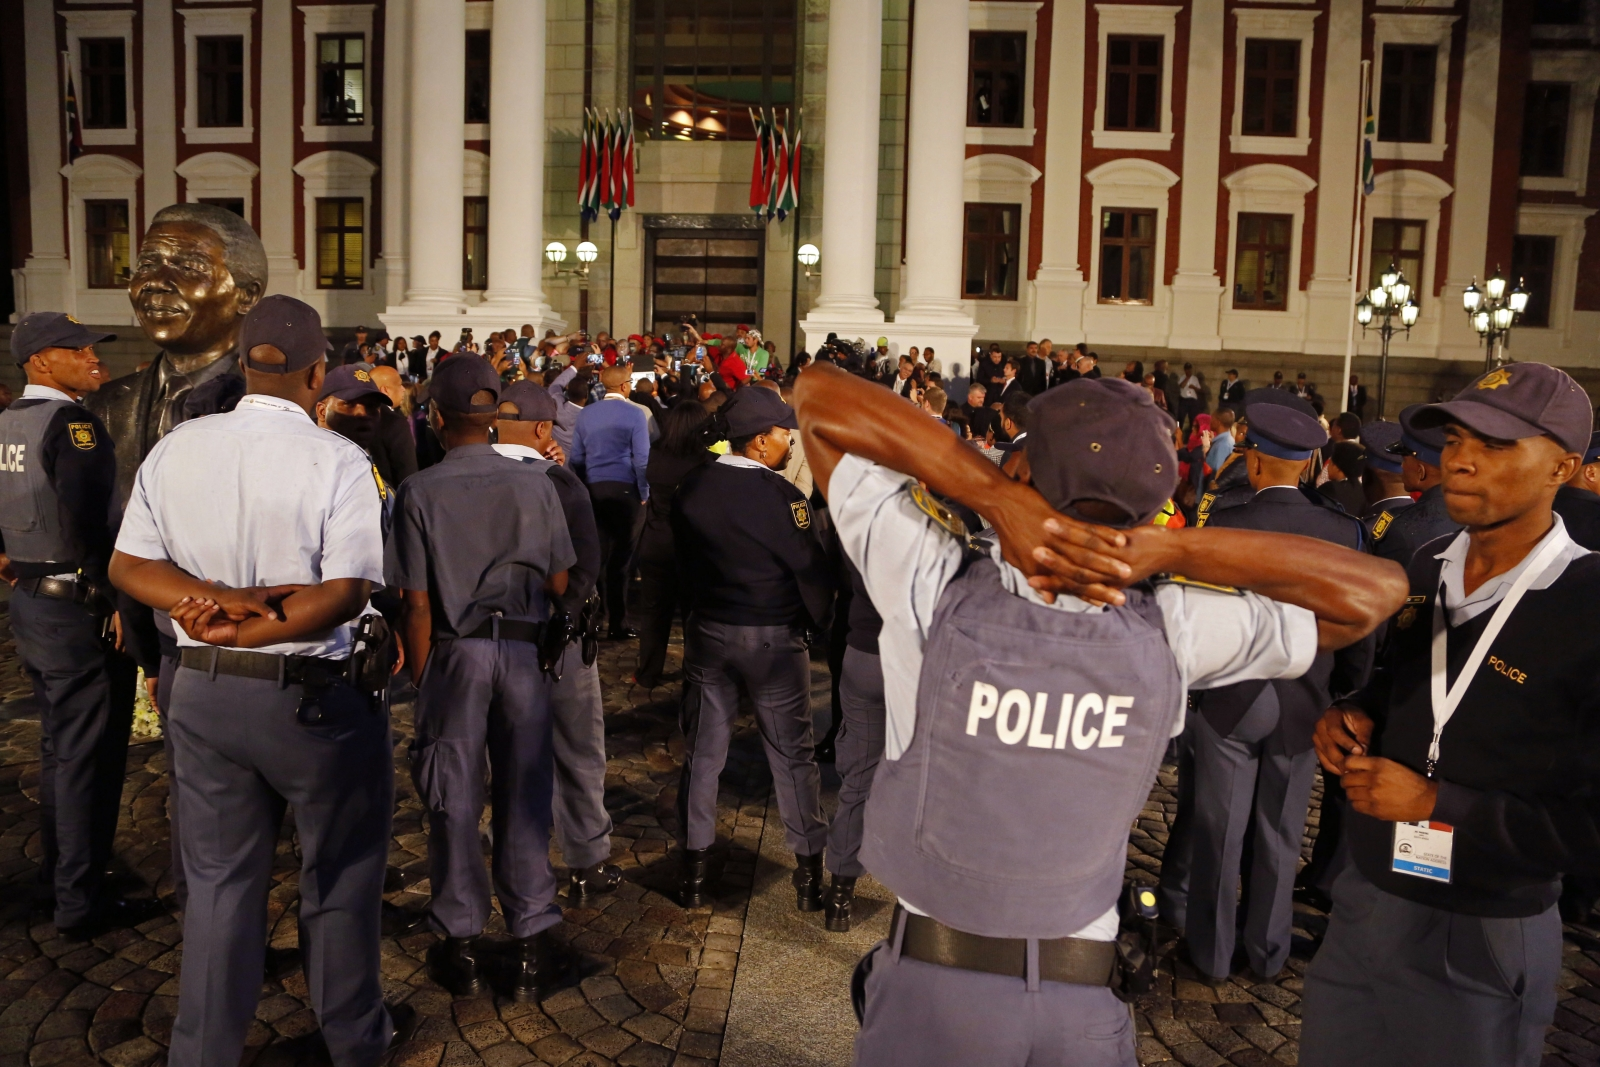 South Africa Zuma police